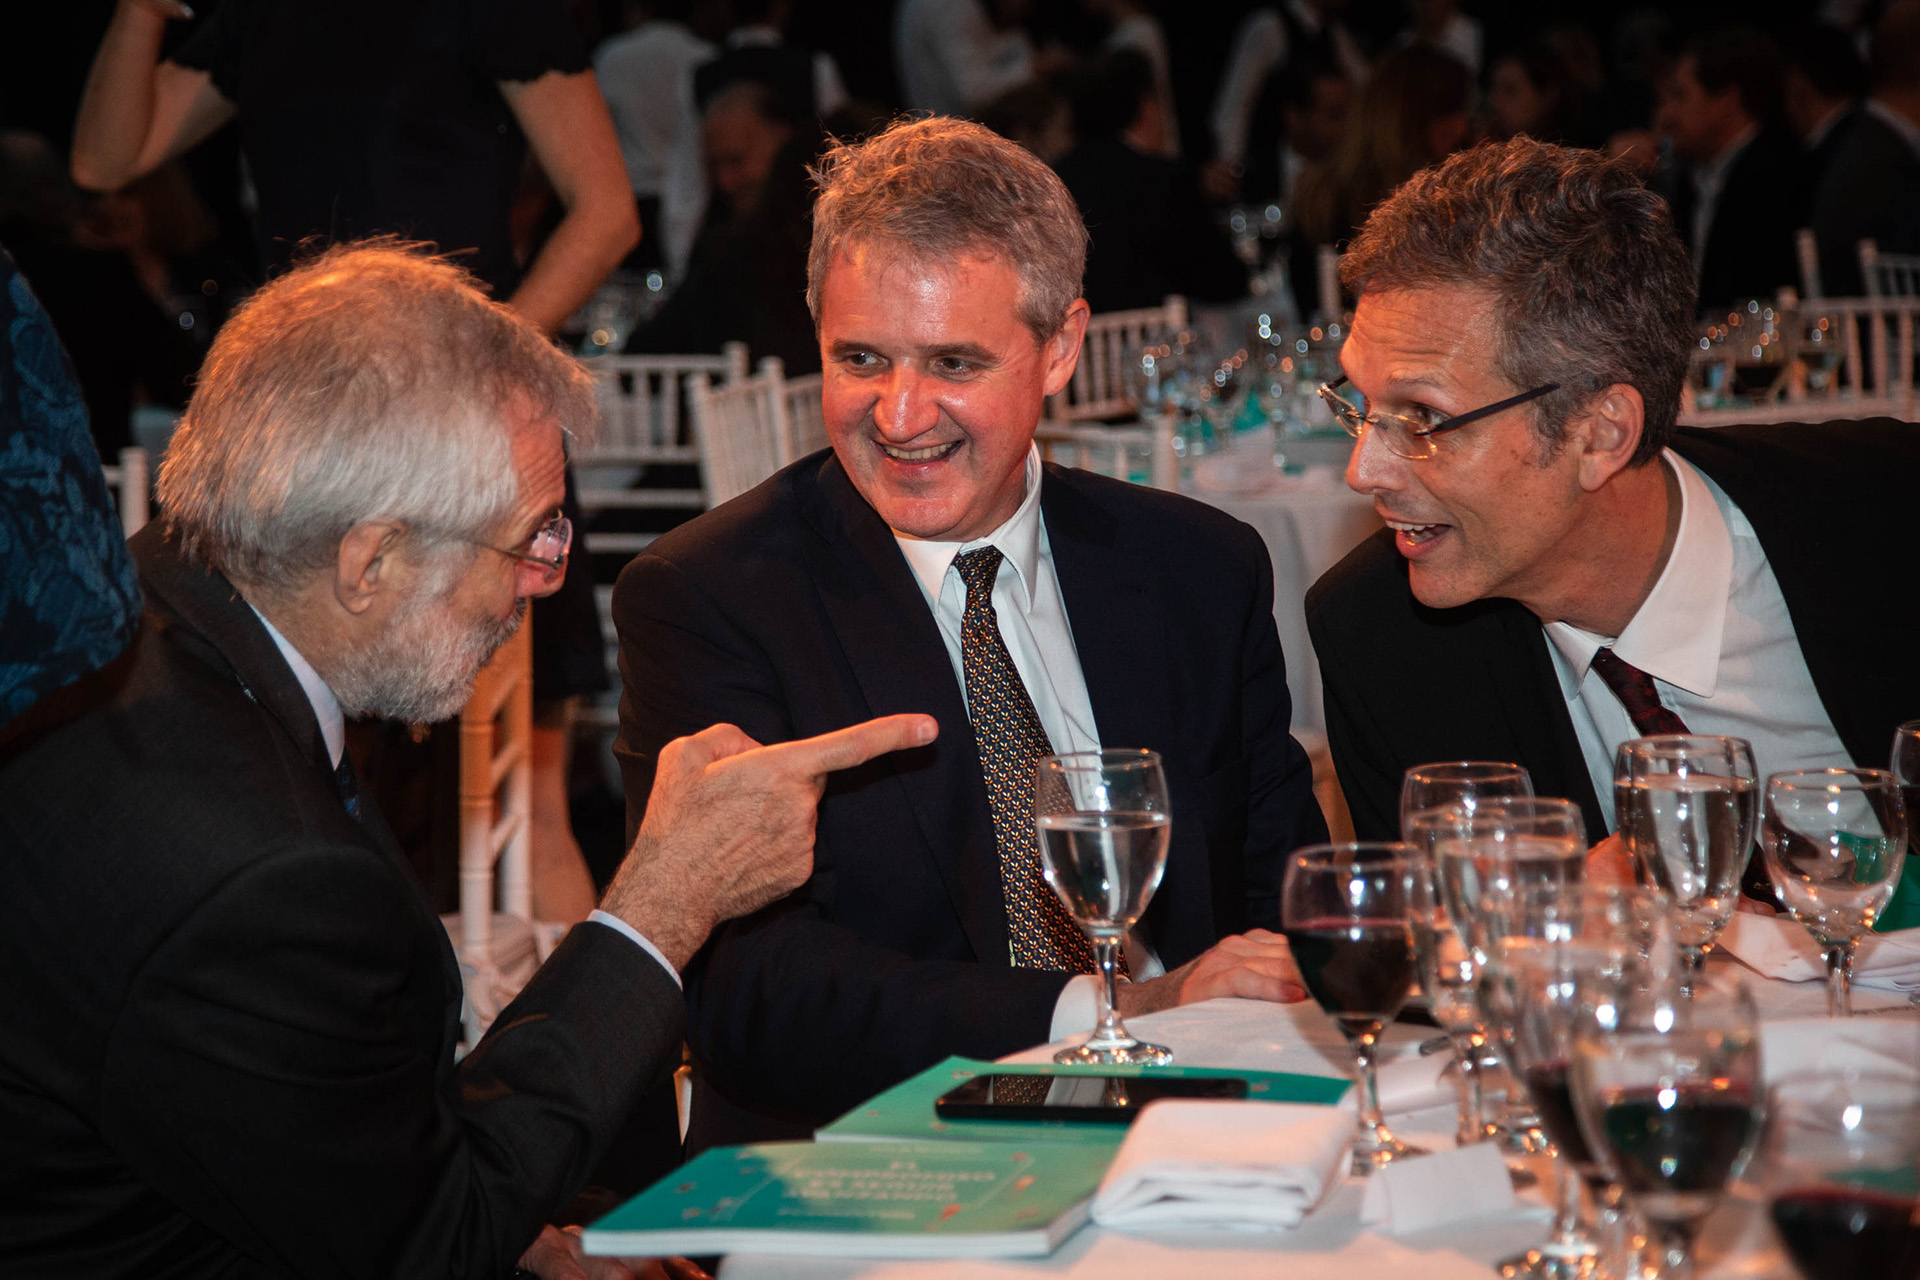 Daniel Perzcyk, Juan José Cruces y Rafael Di Tella